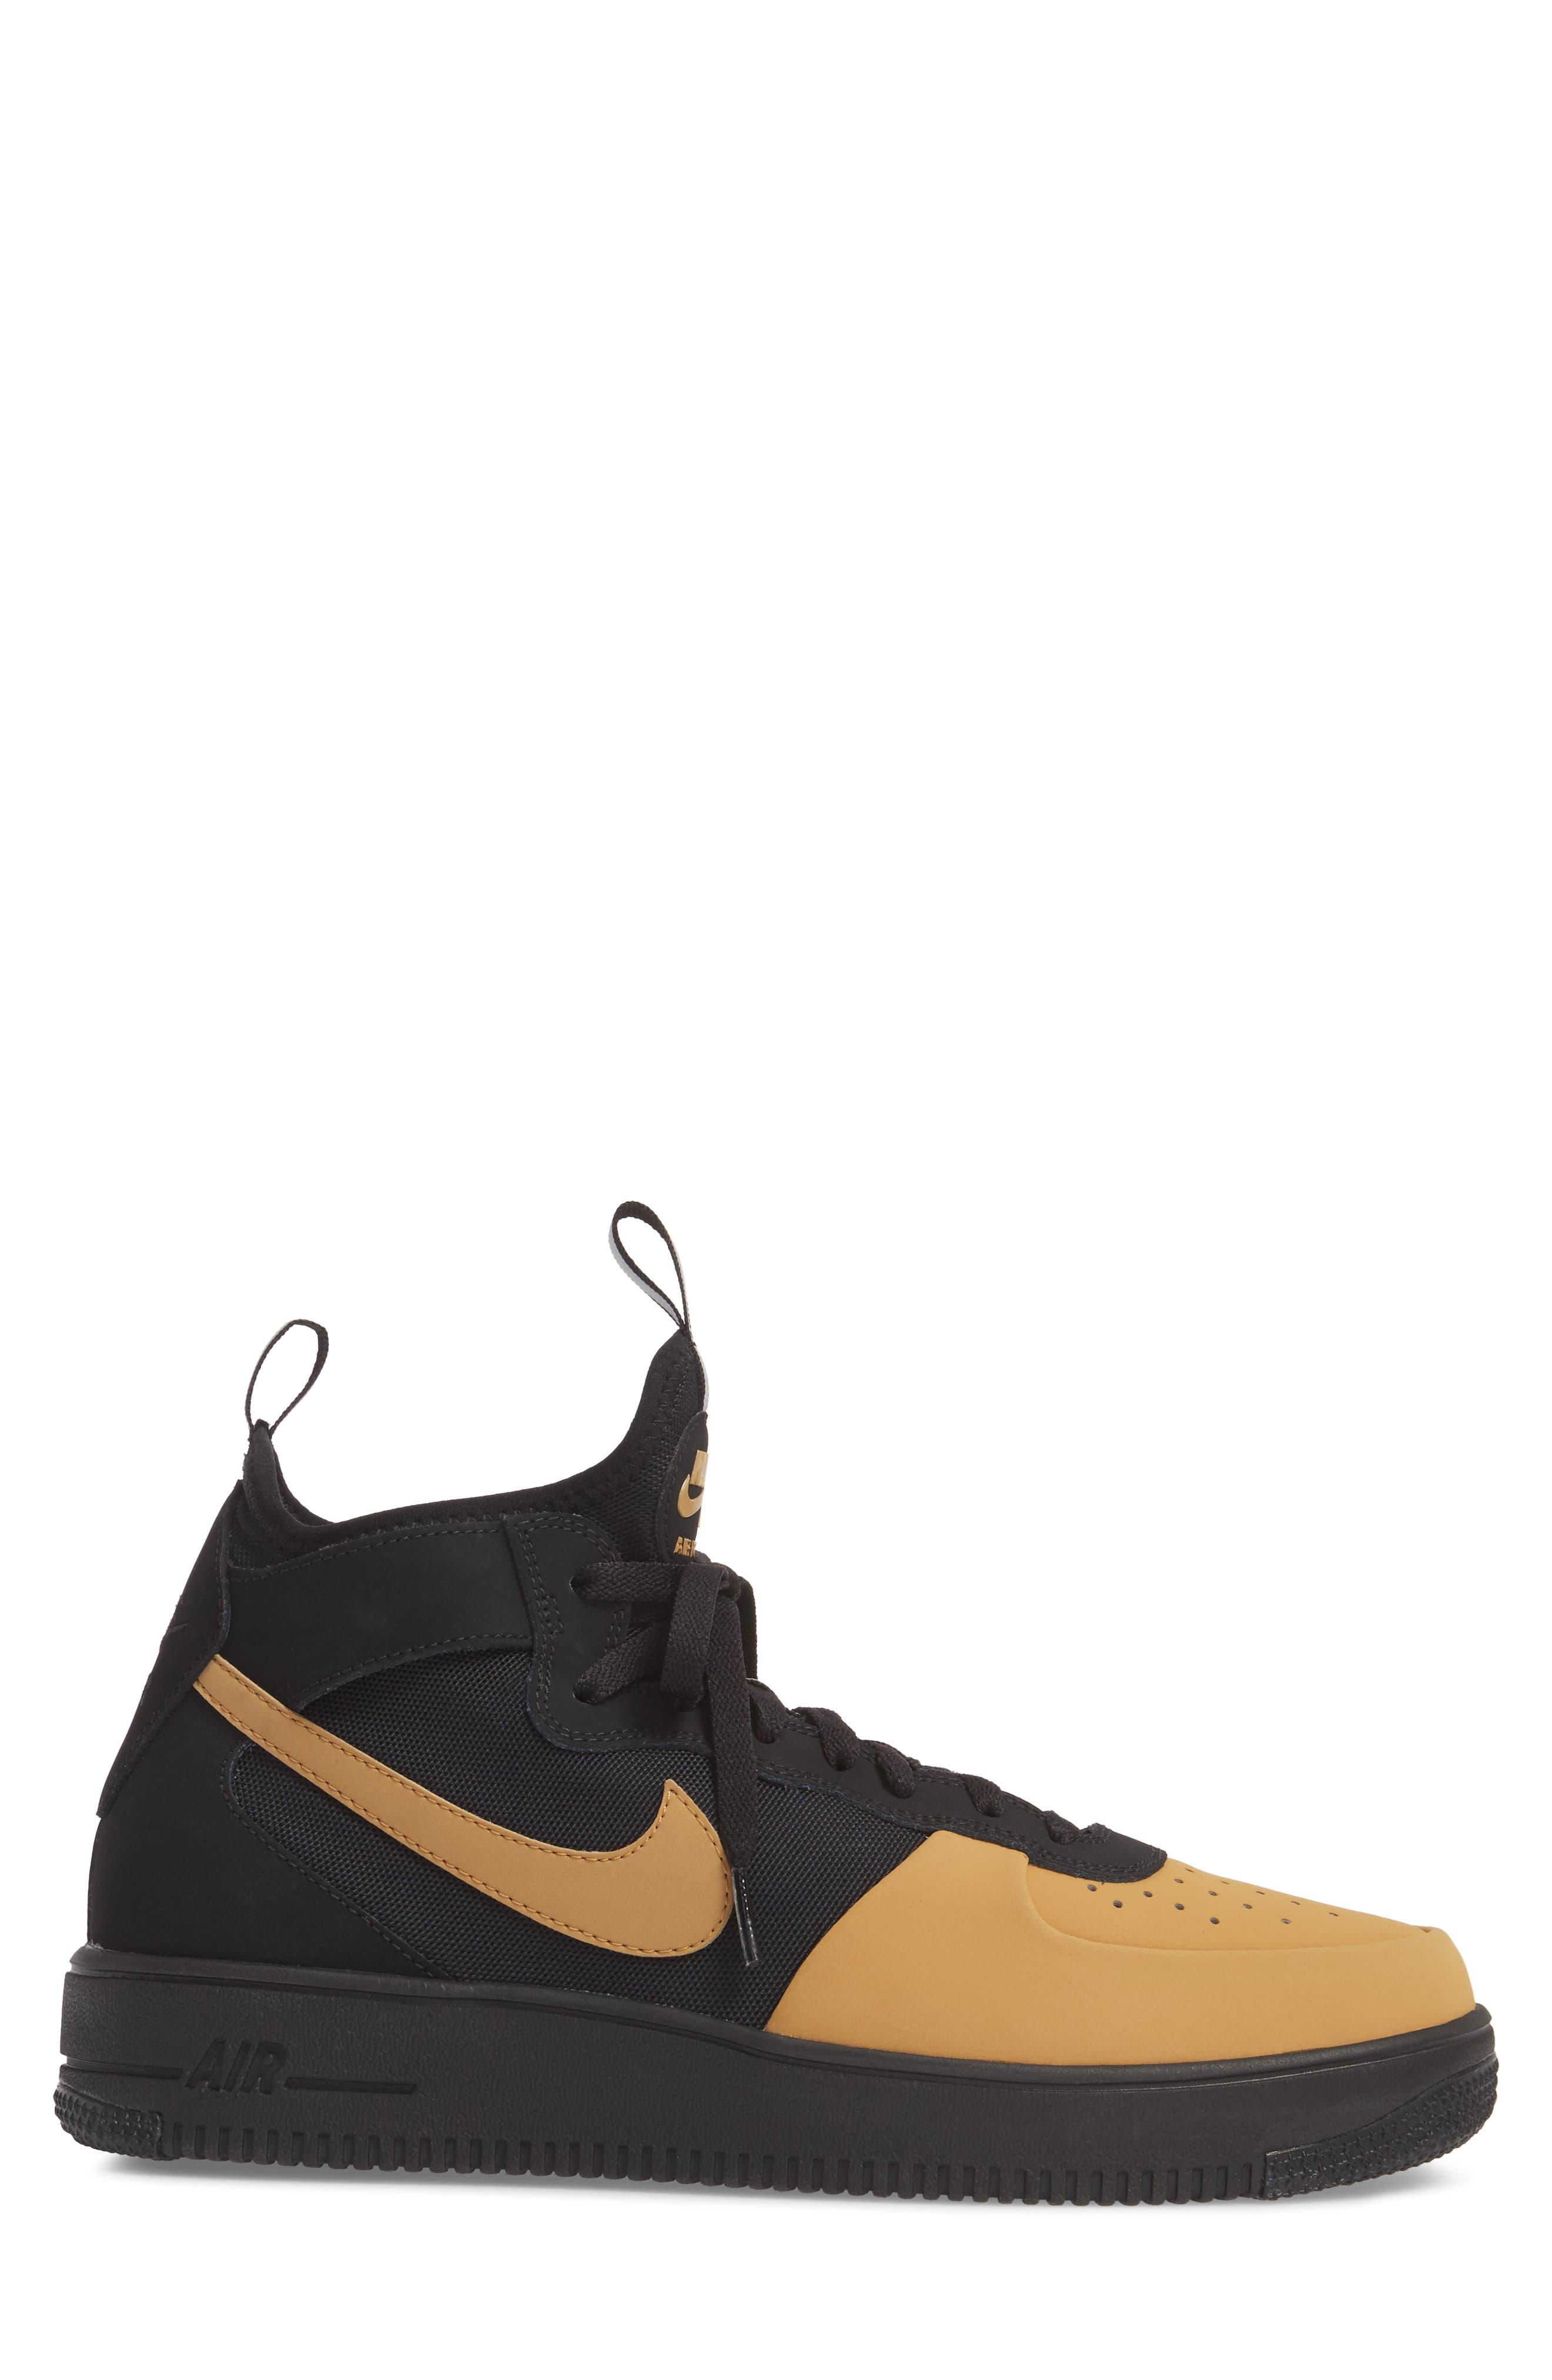 Air Force 1 Ultraforce Mid Tech Sneaker,                             Alternate thumbnail 3, color,                             002